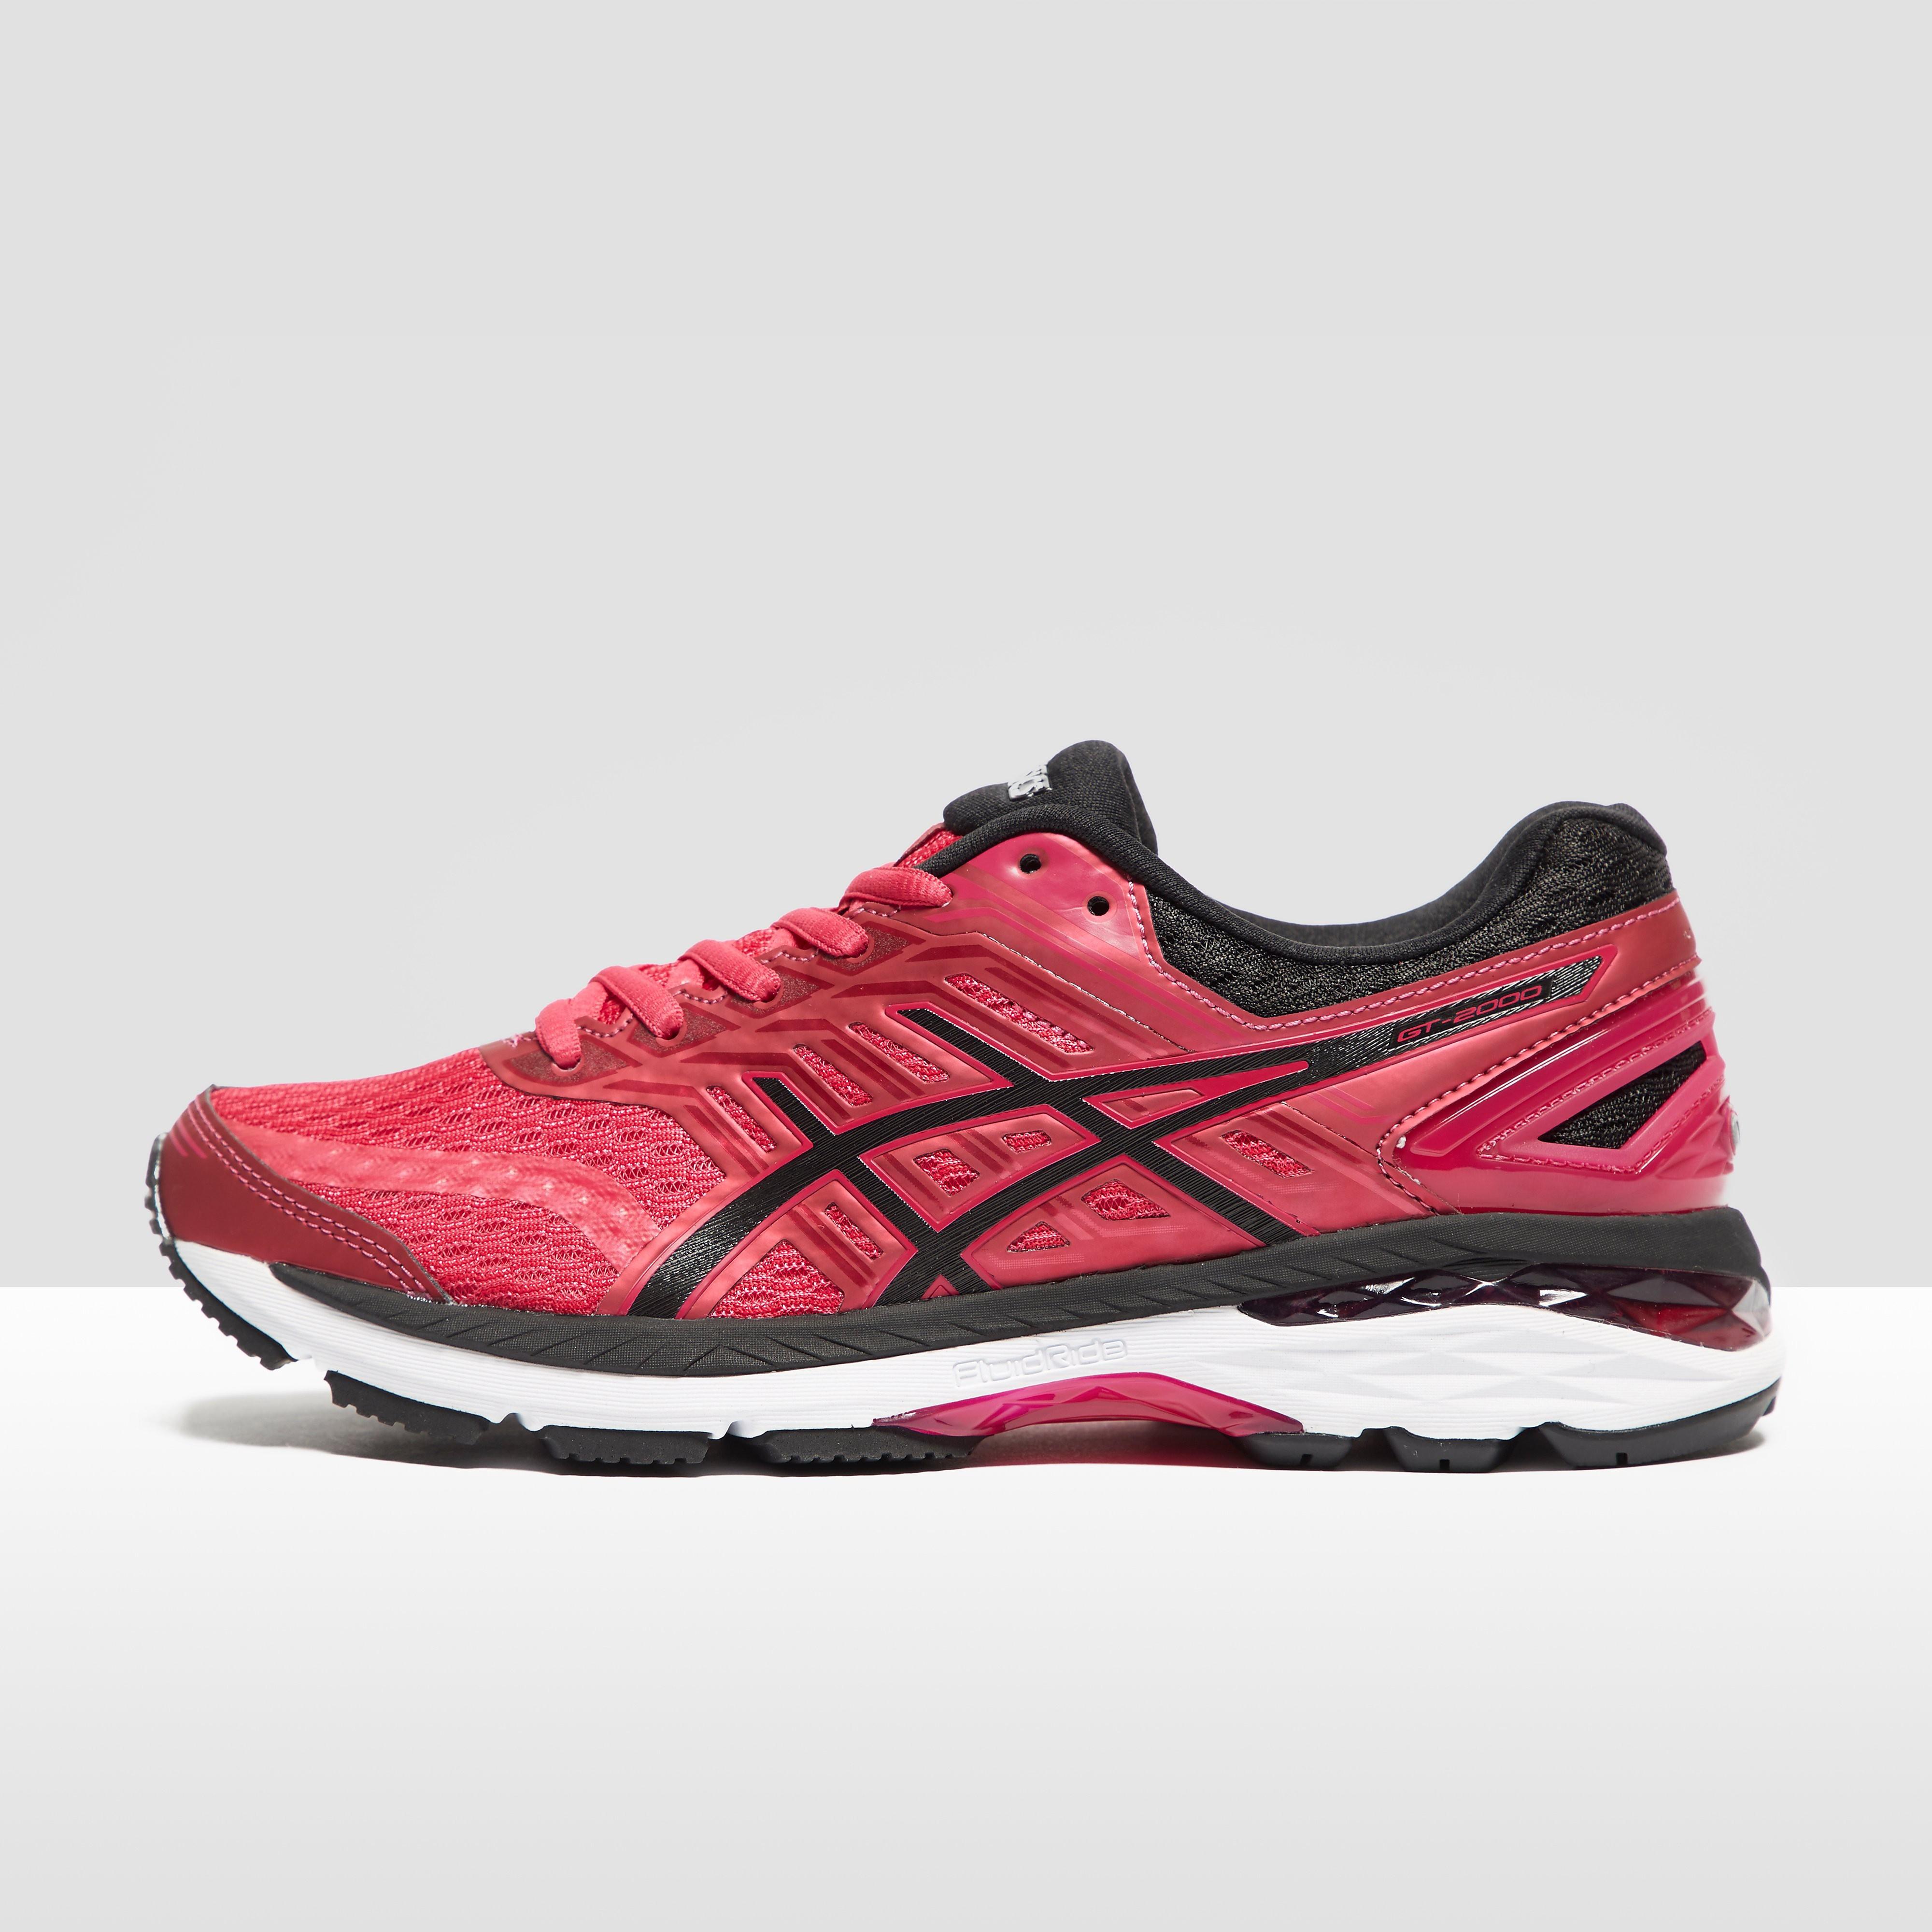 ASICS the GT-2000 Women's Running Shoes